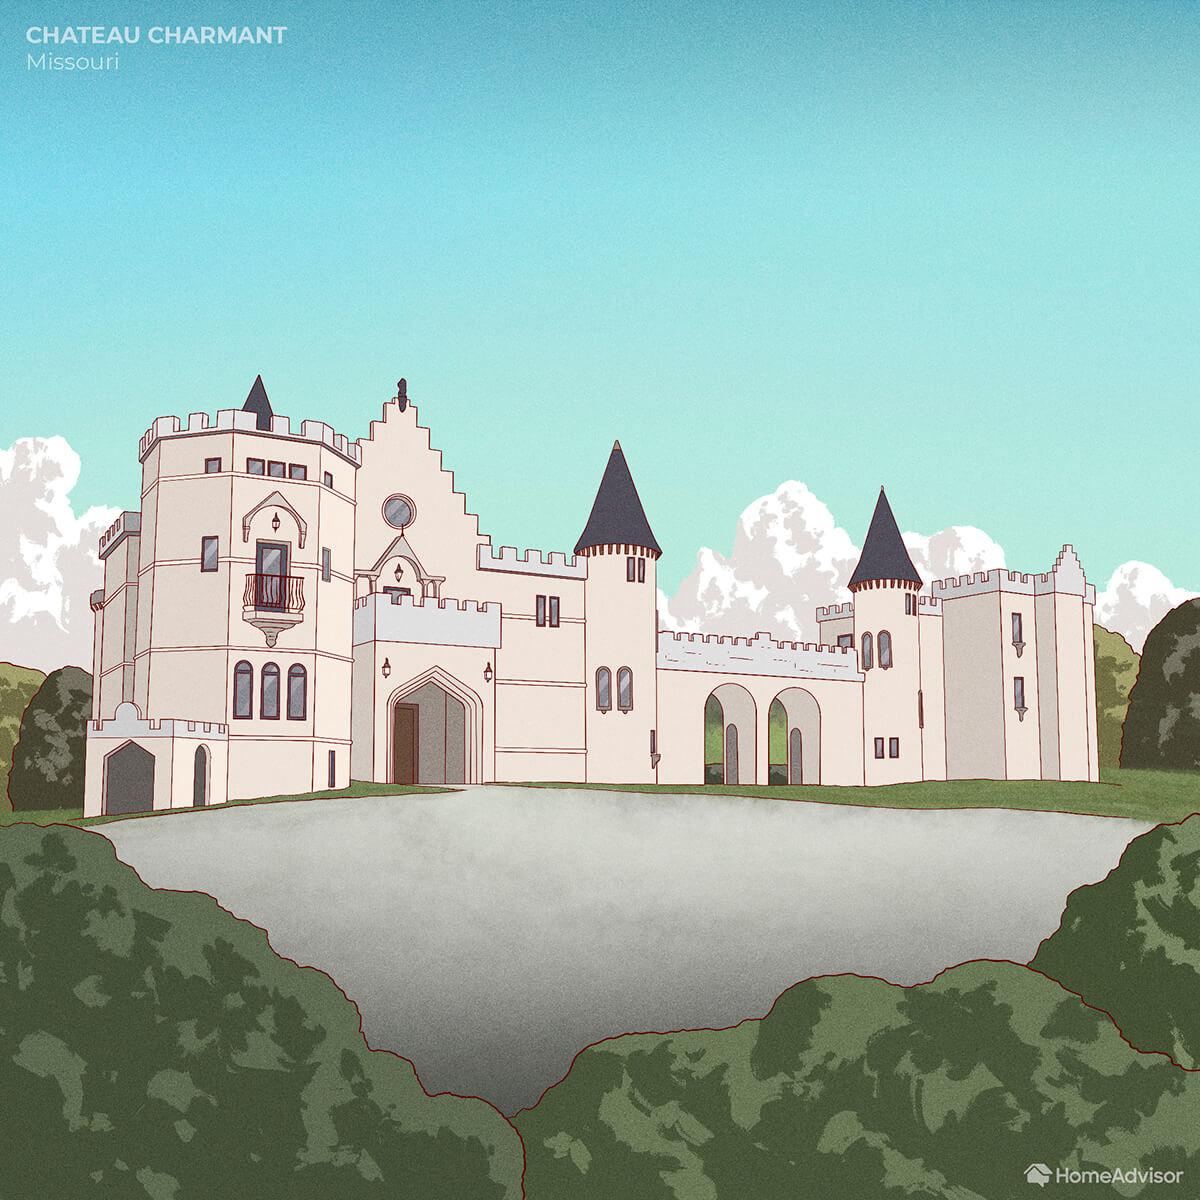 Chateau Charmant